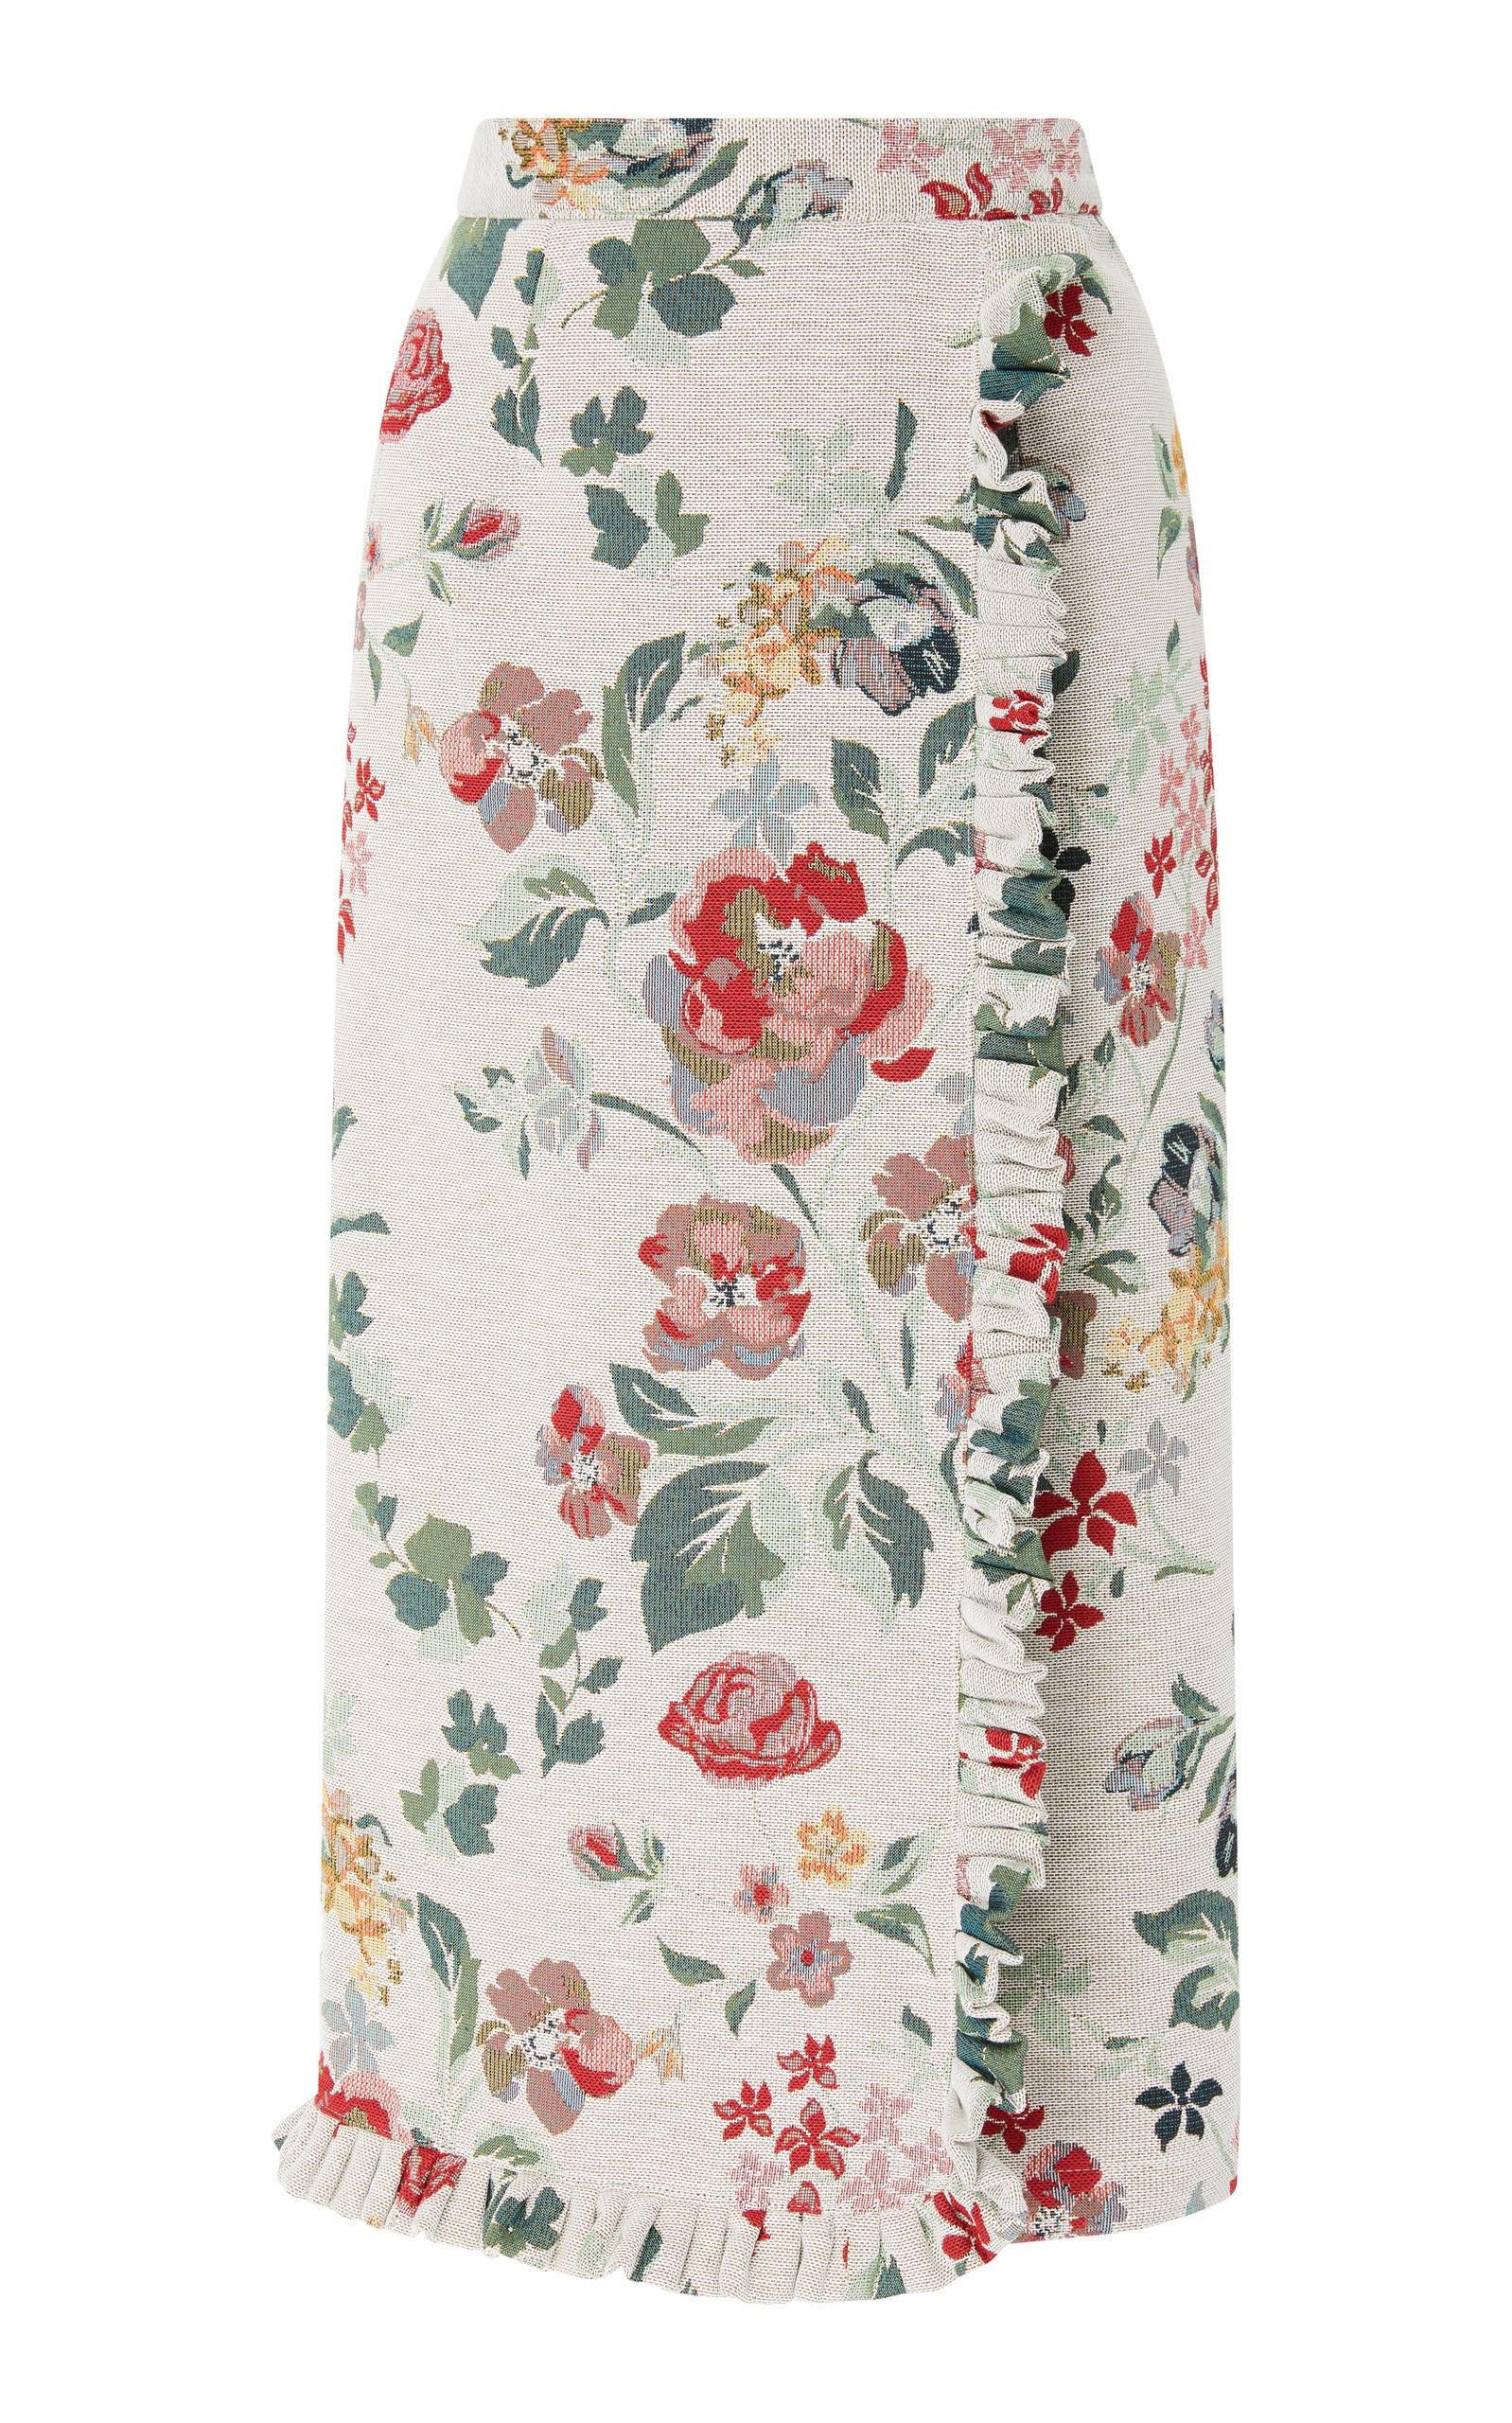 ALCOOLIQUE Rola Midi Skirt in Floral